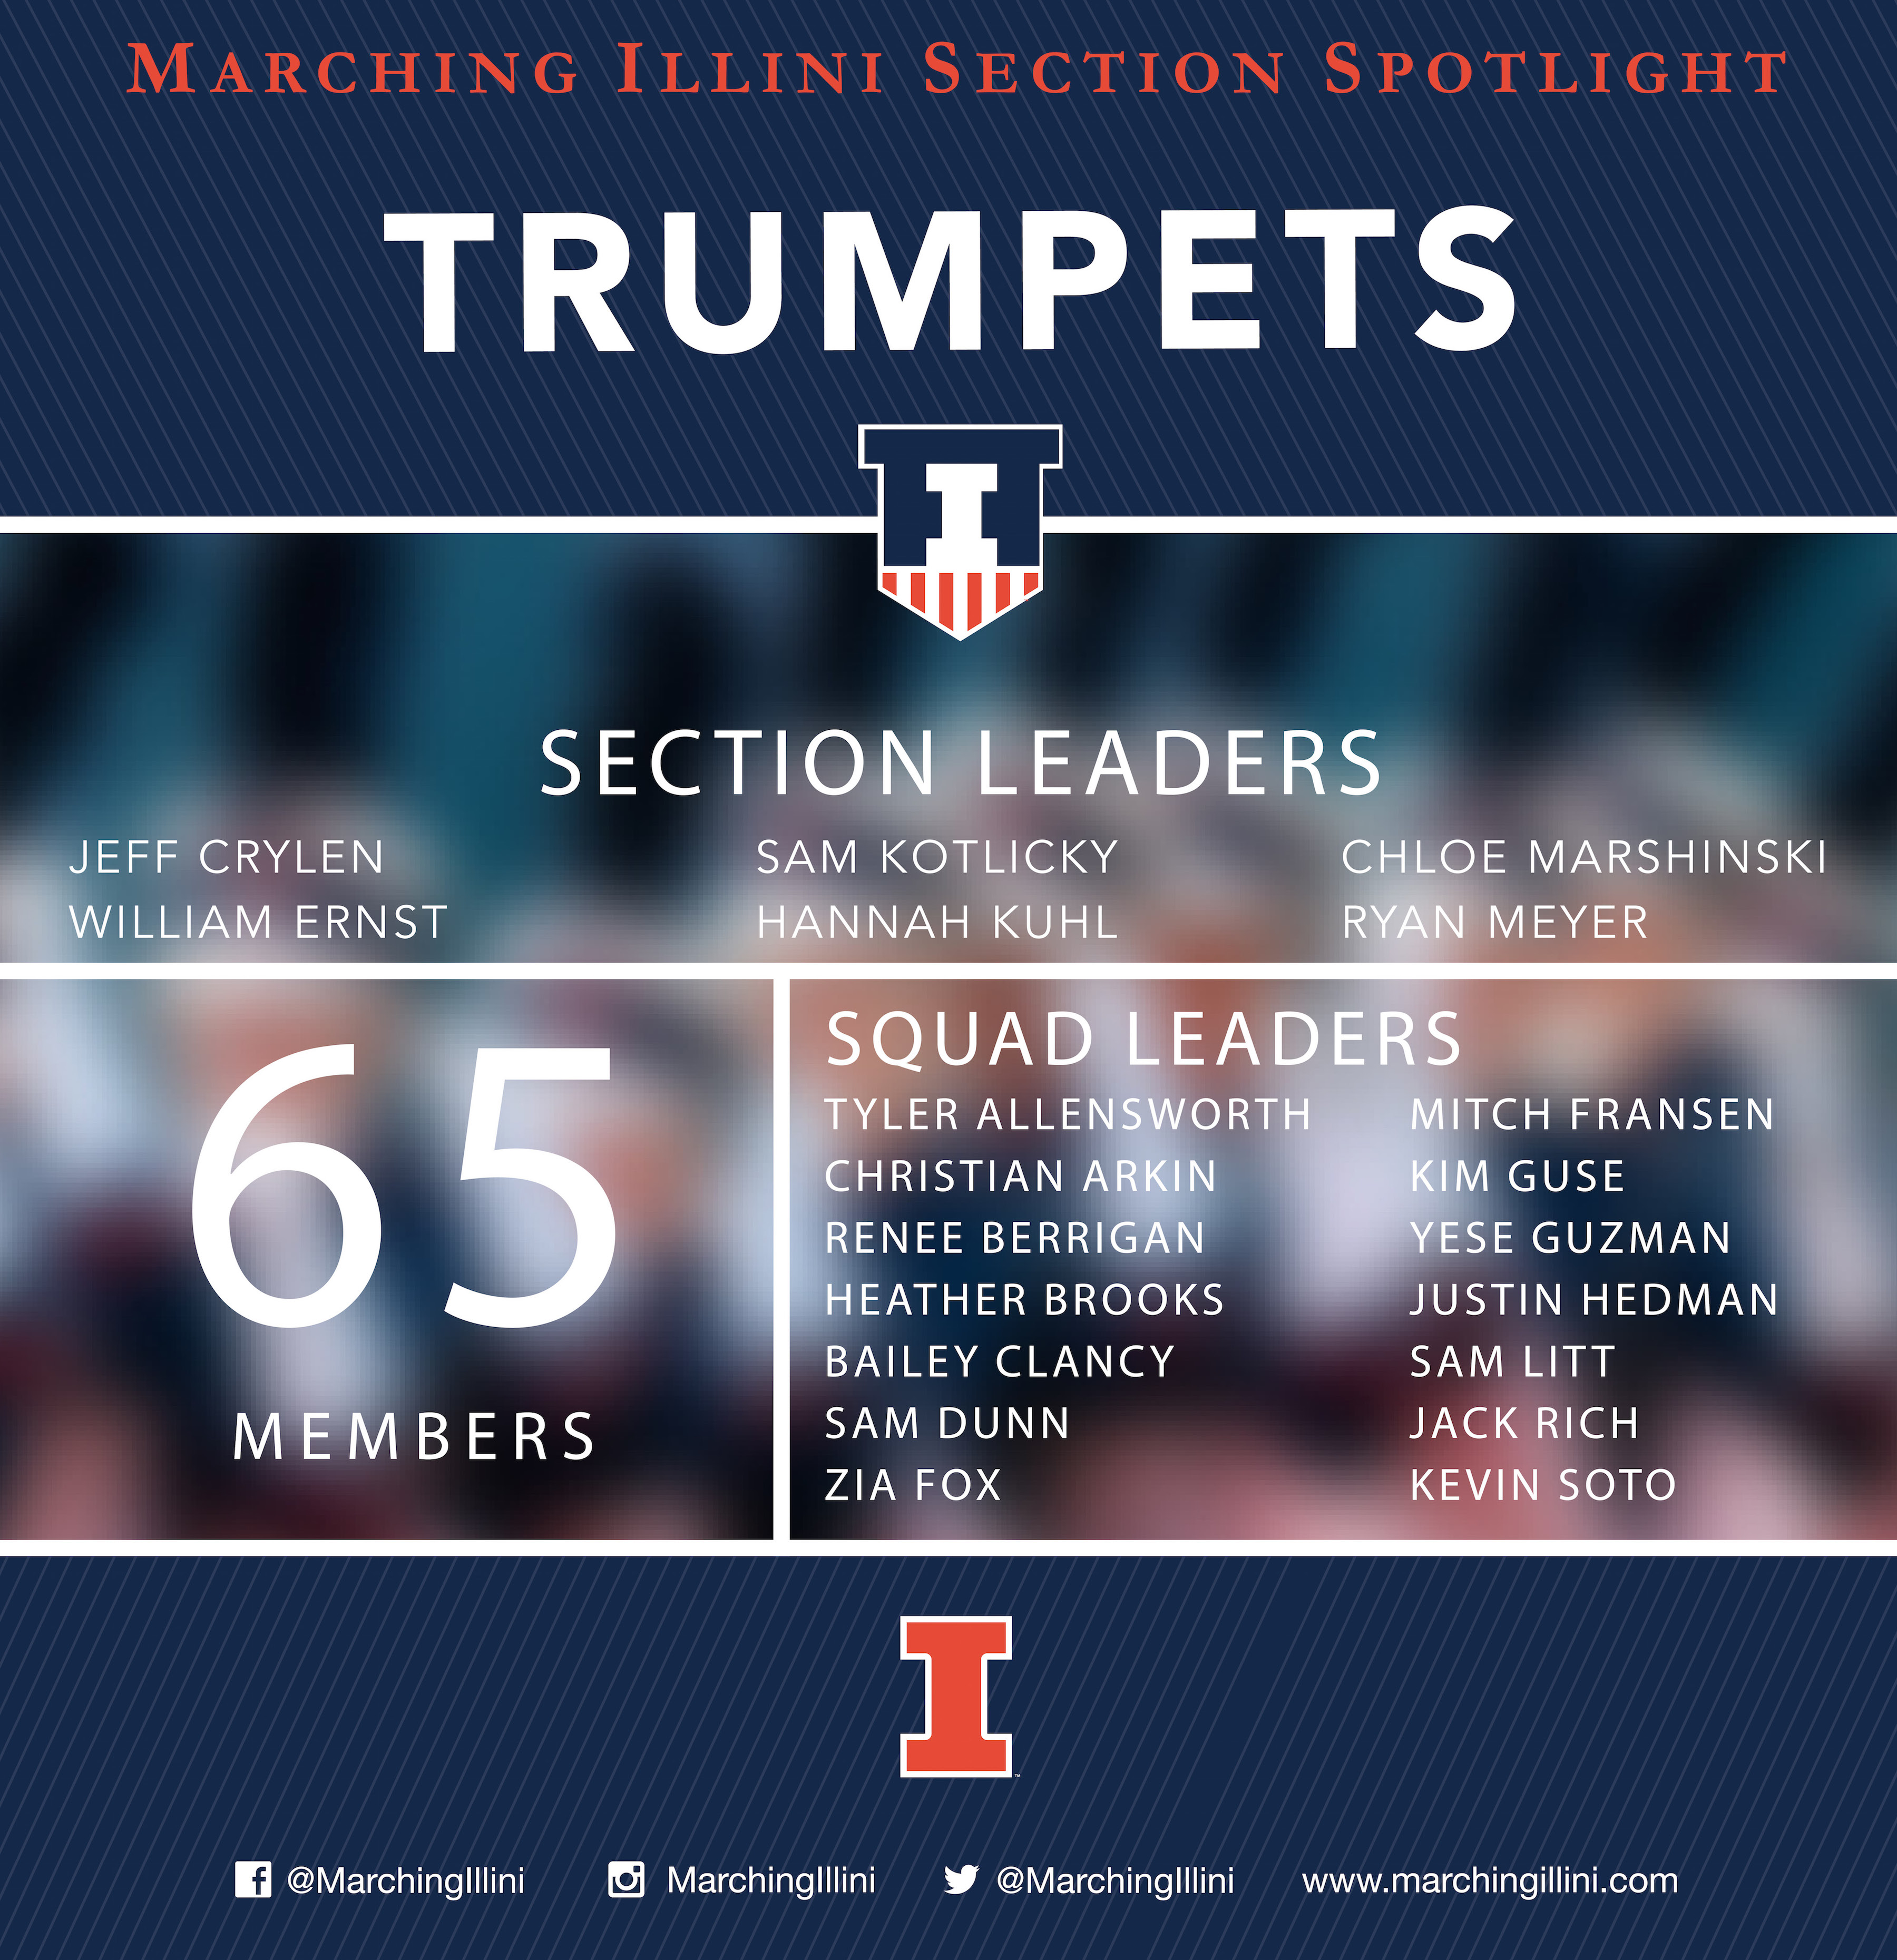 section-spotlight-trumpets